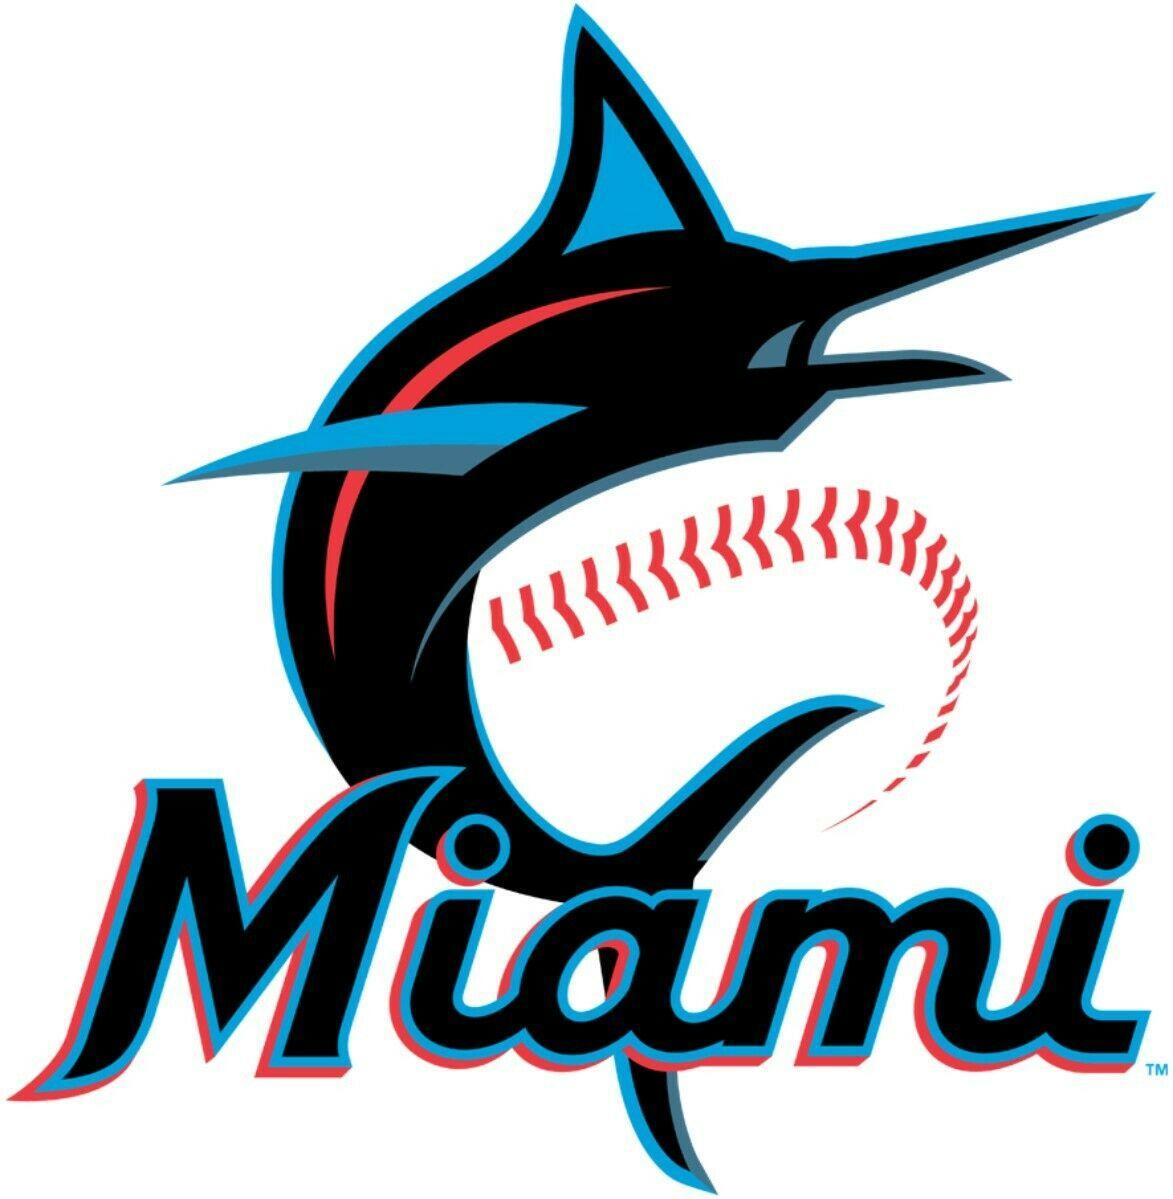 Miami Marlins #8 MLB Team Pro Sports Vinyl Sticker Decal Car Window Wall - $4.46 - $8.62